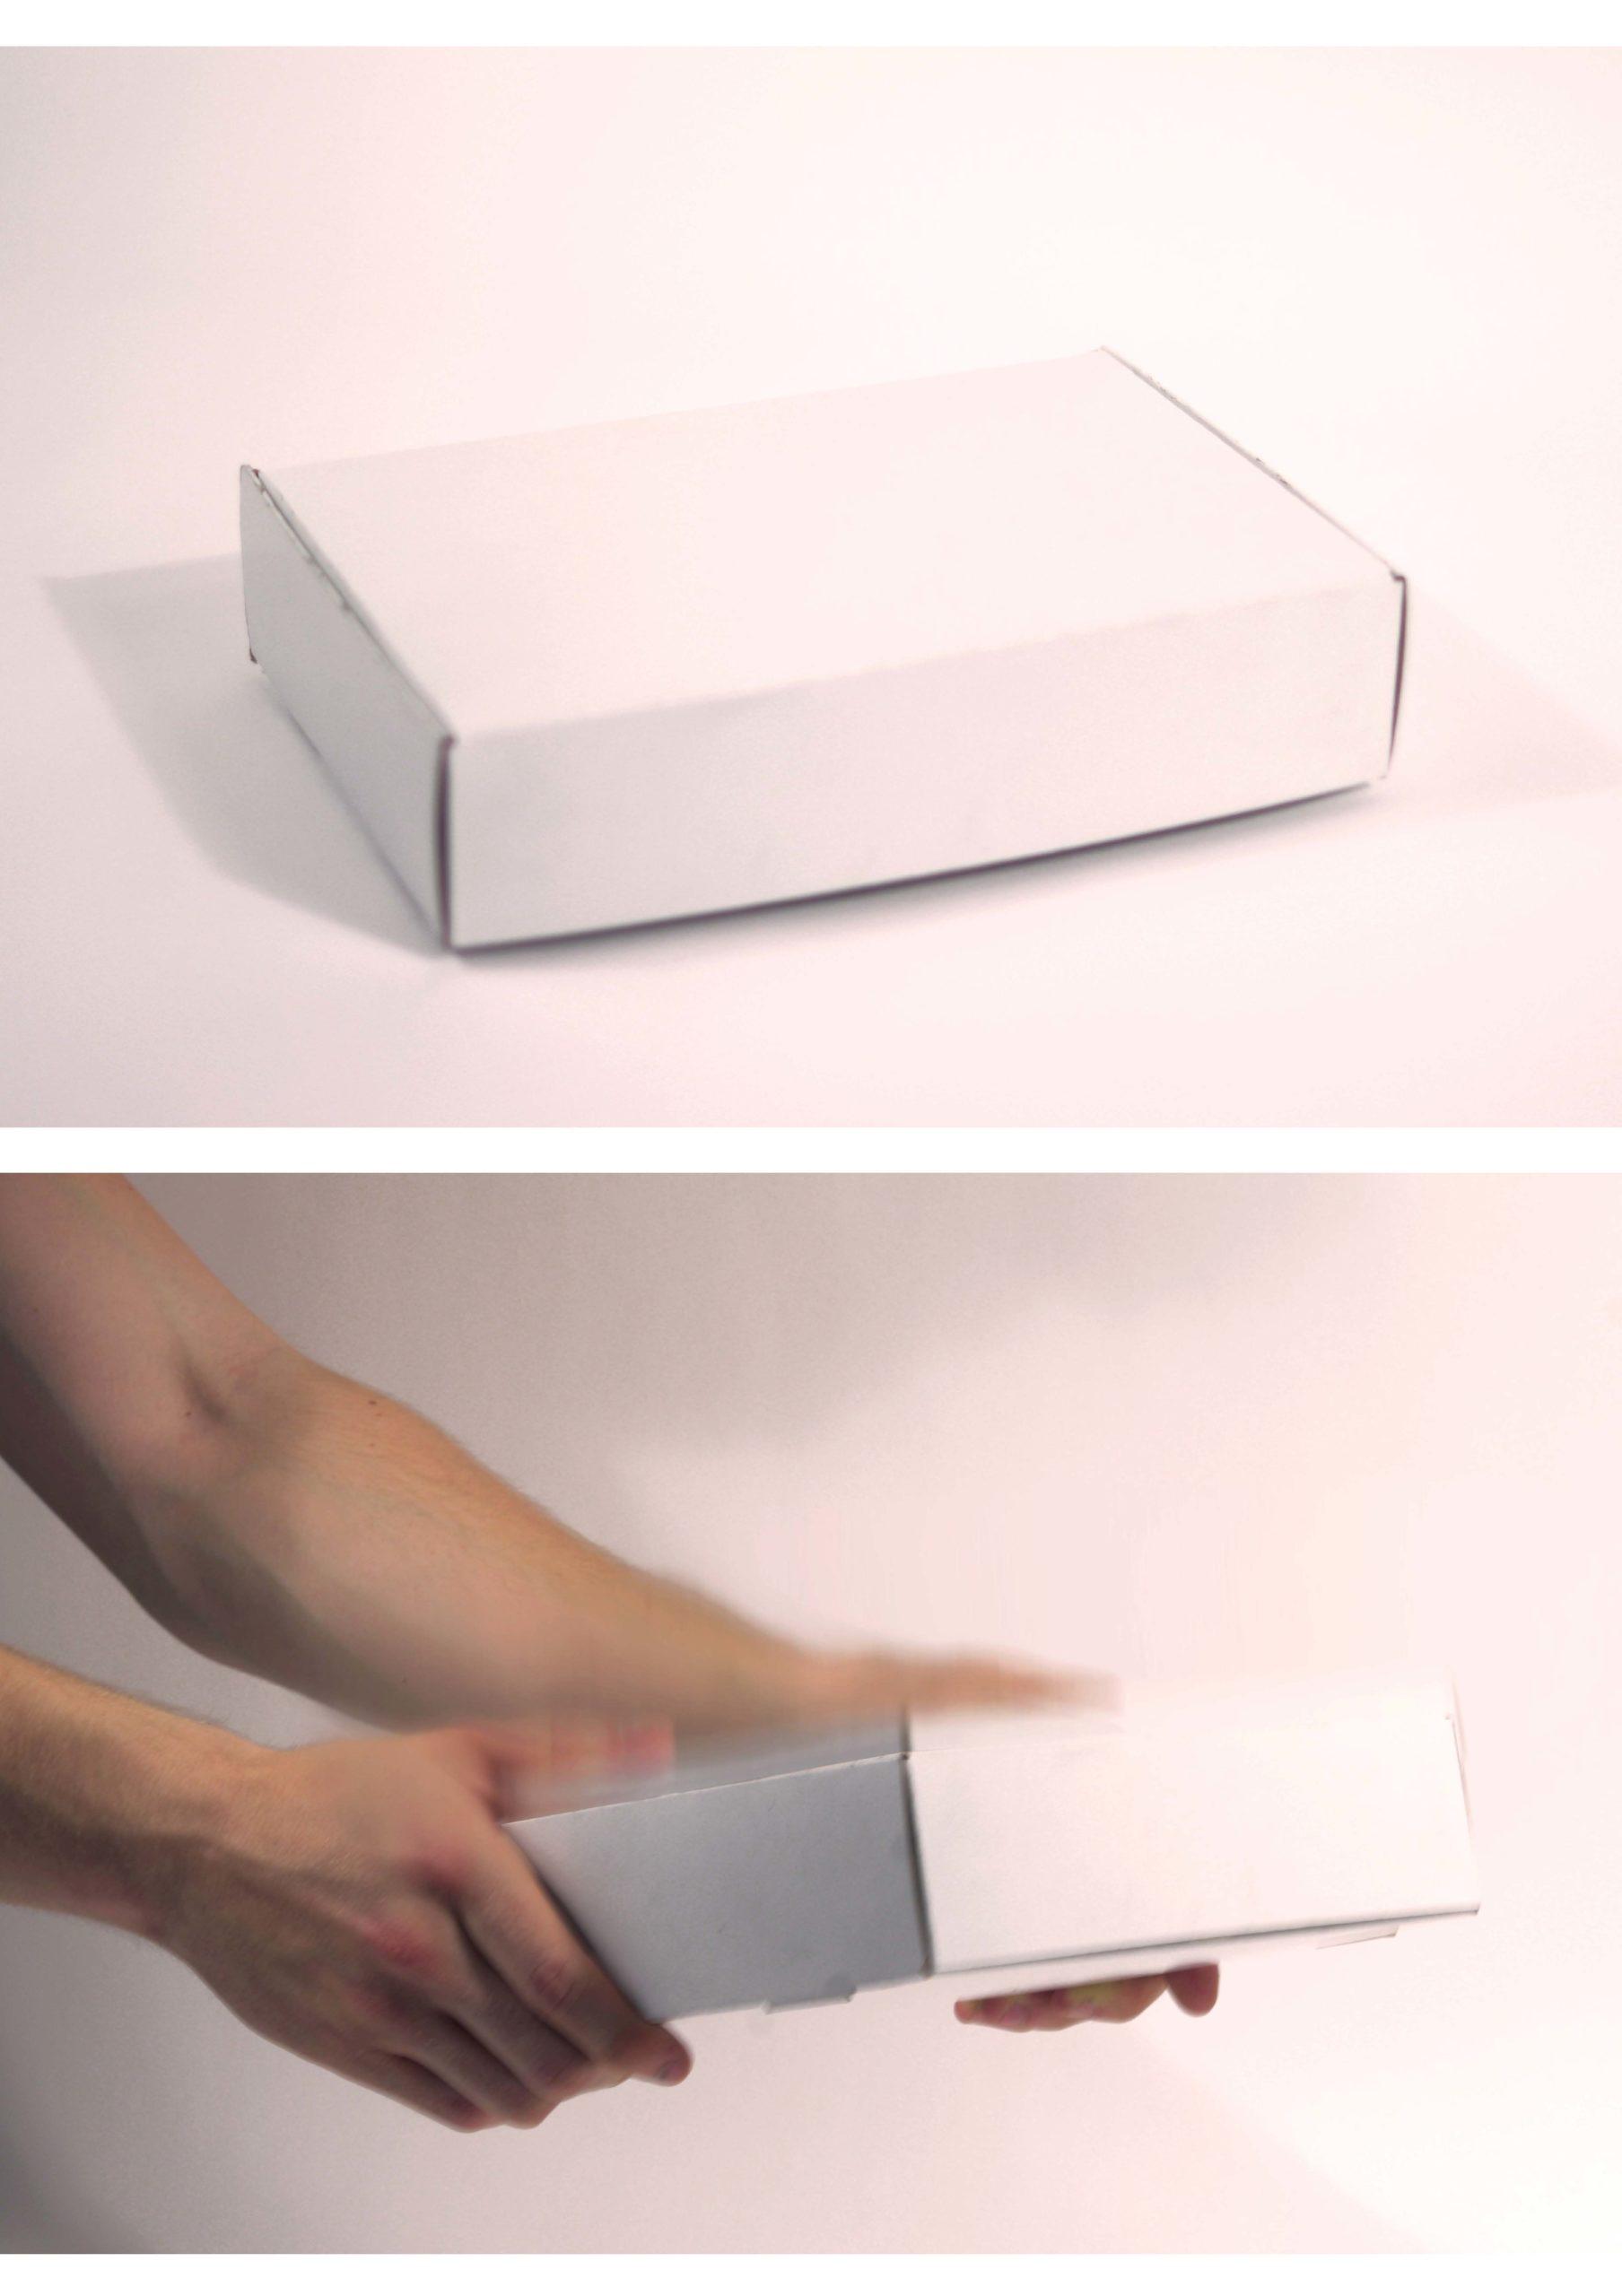 carton-award-image 233553